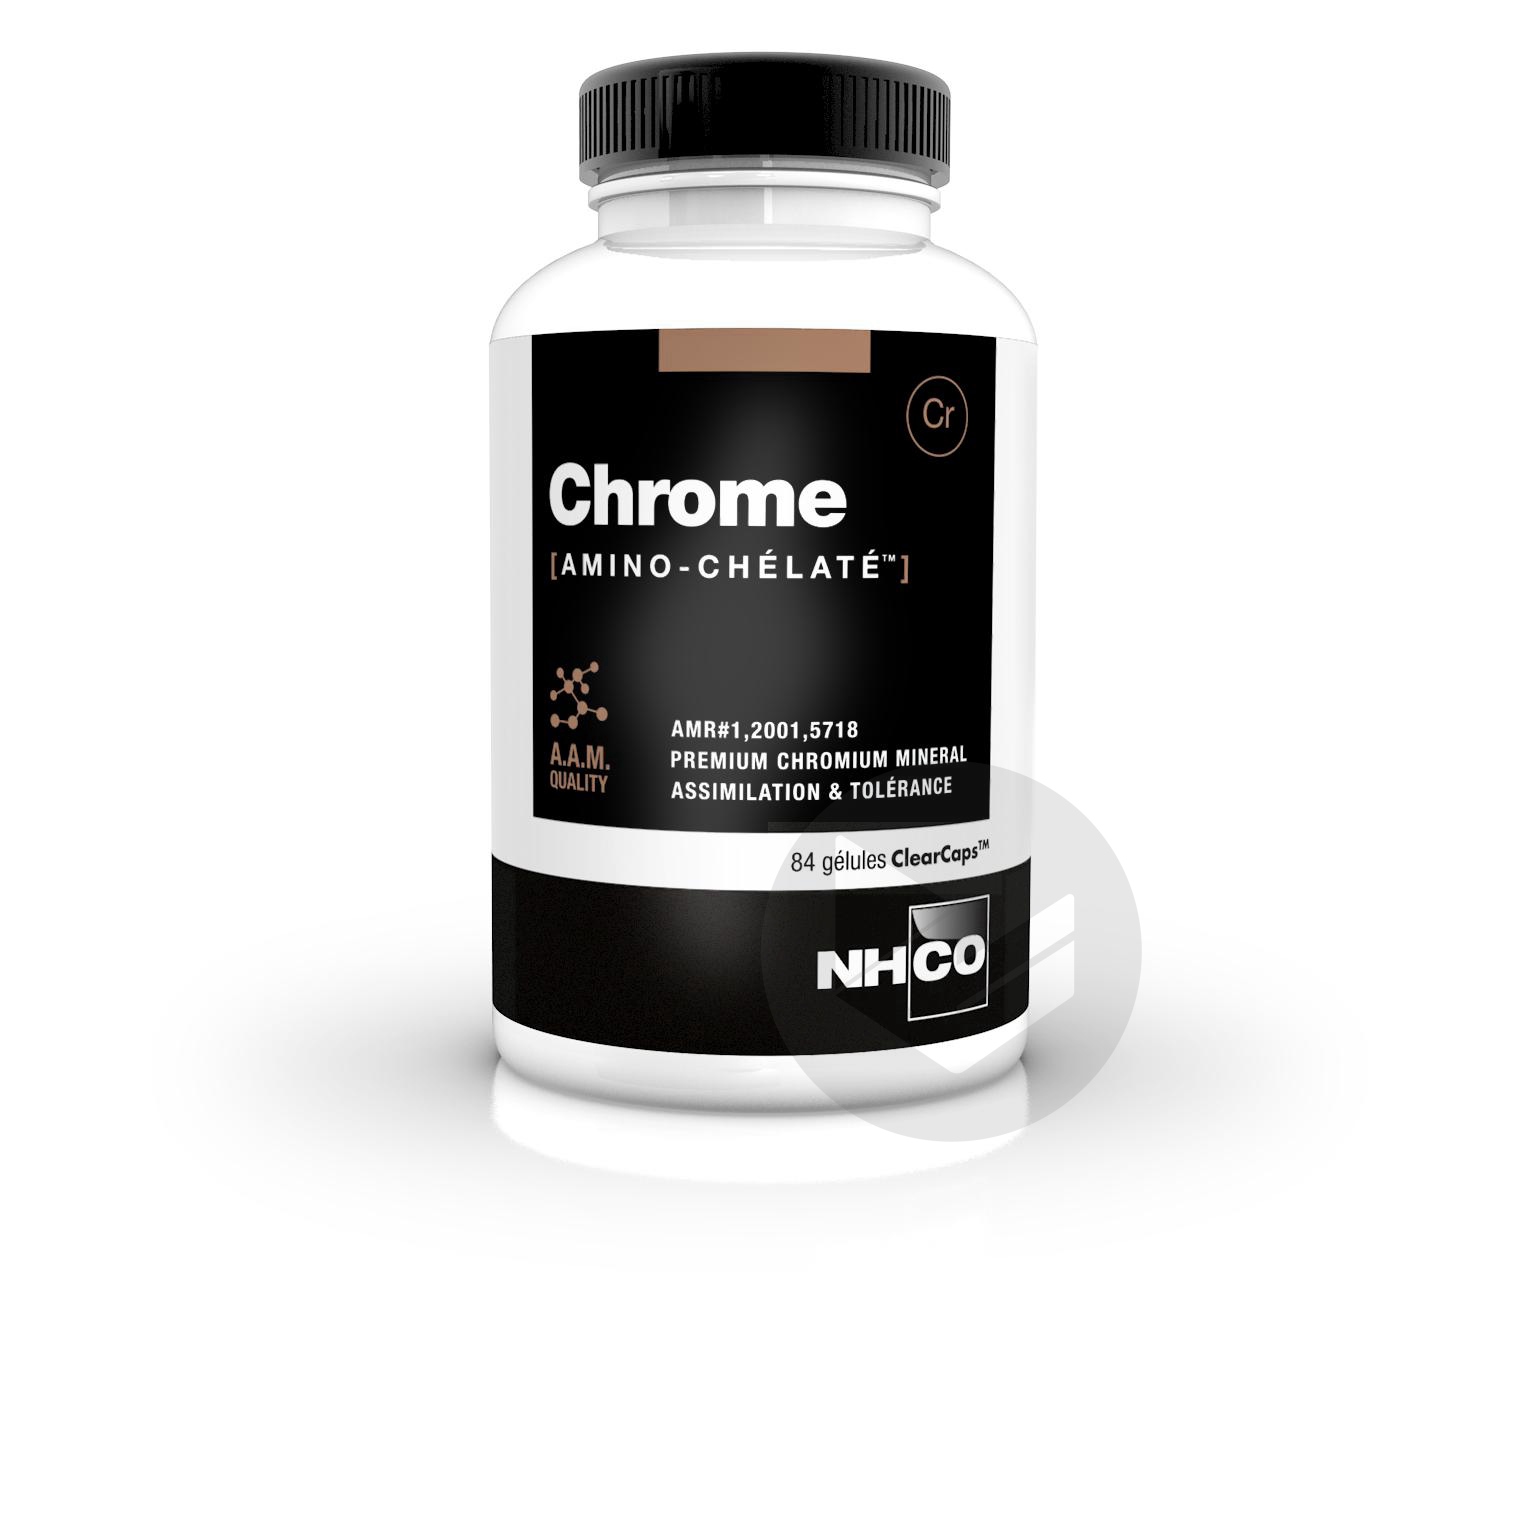 Chrome Amino-chélaté 84 gélules